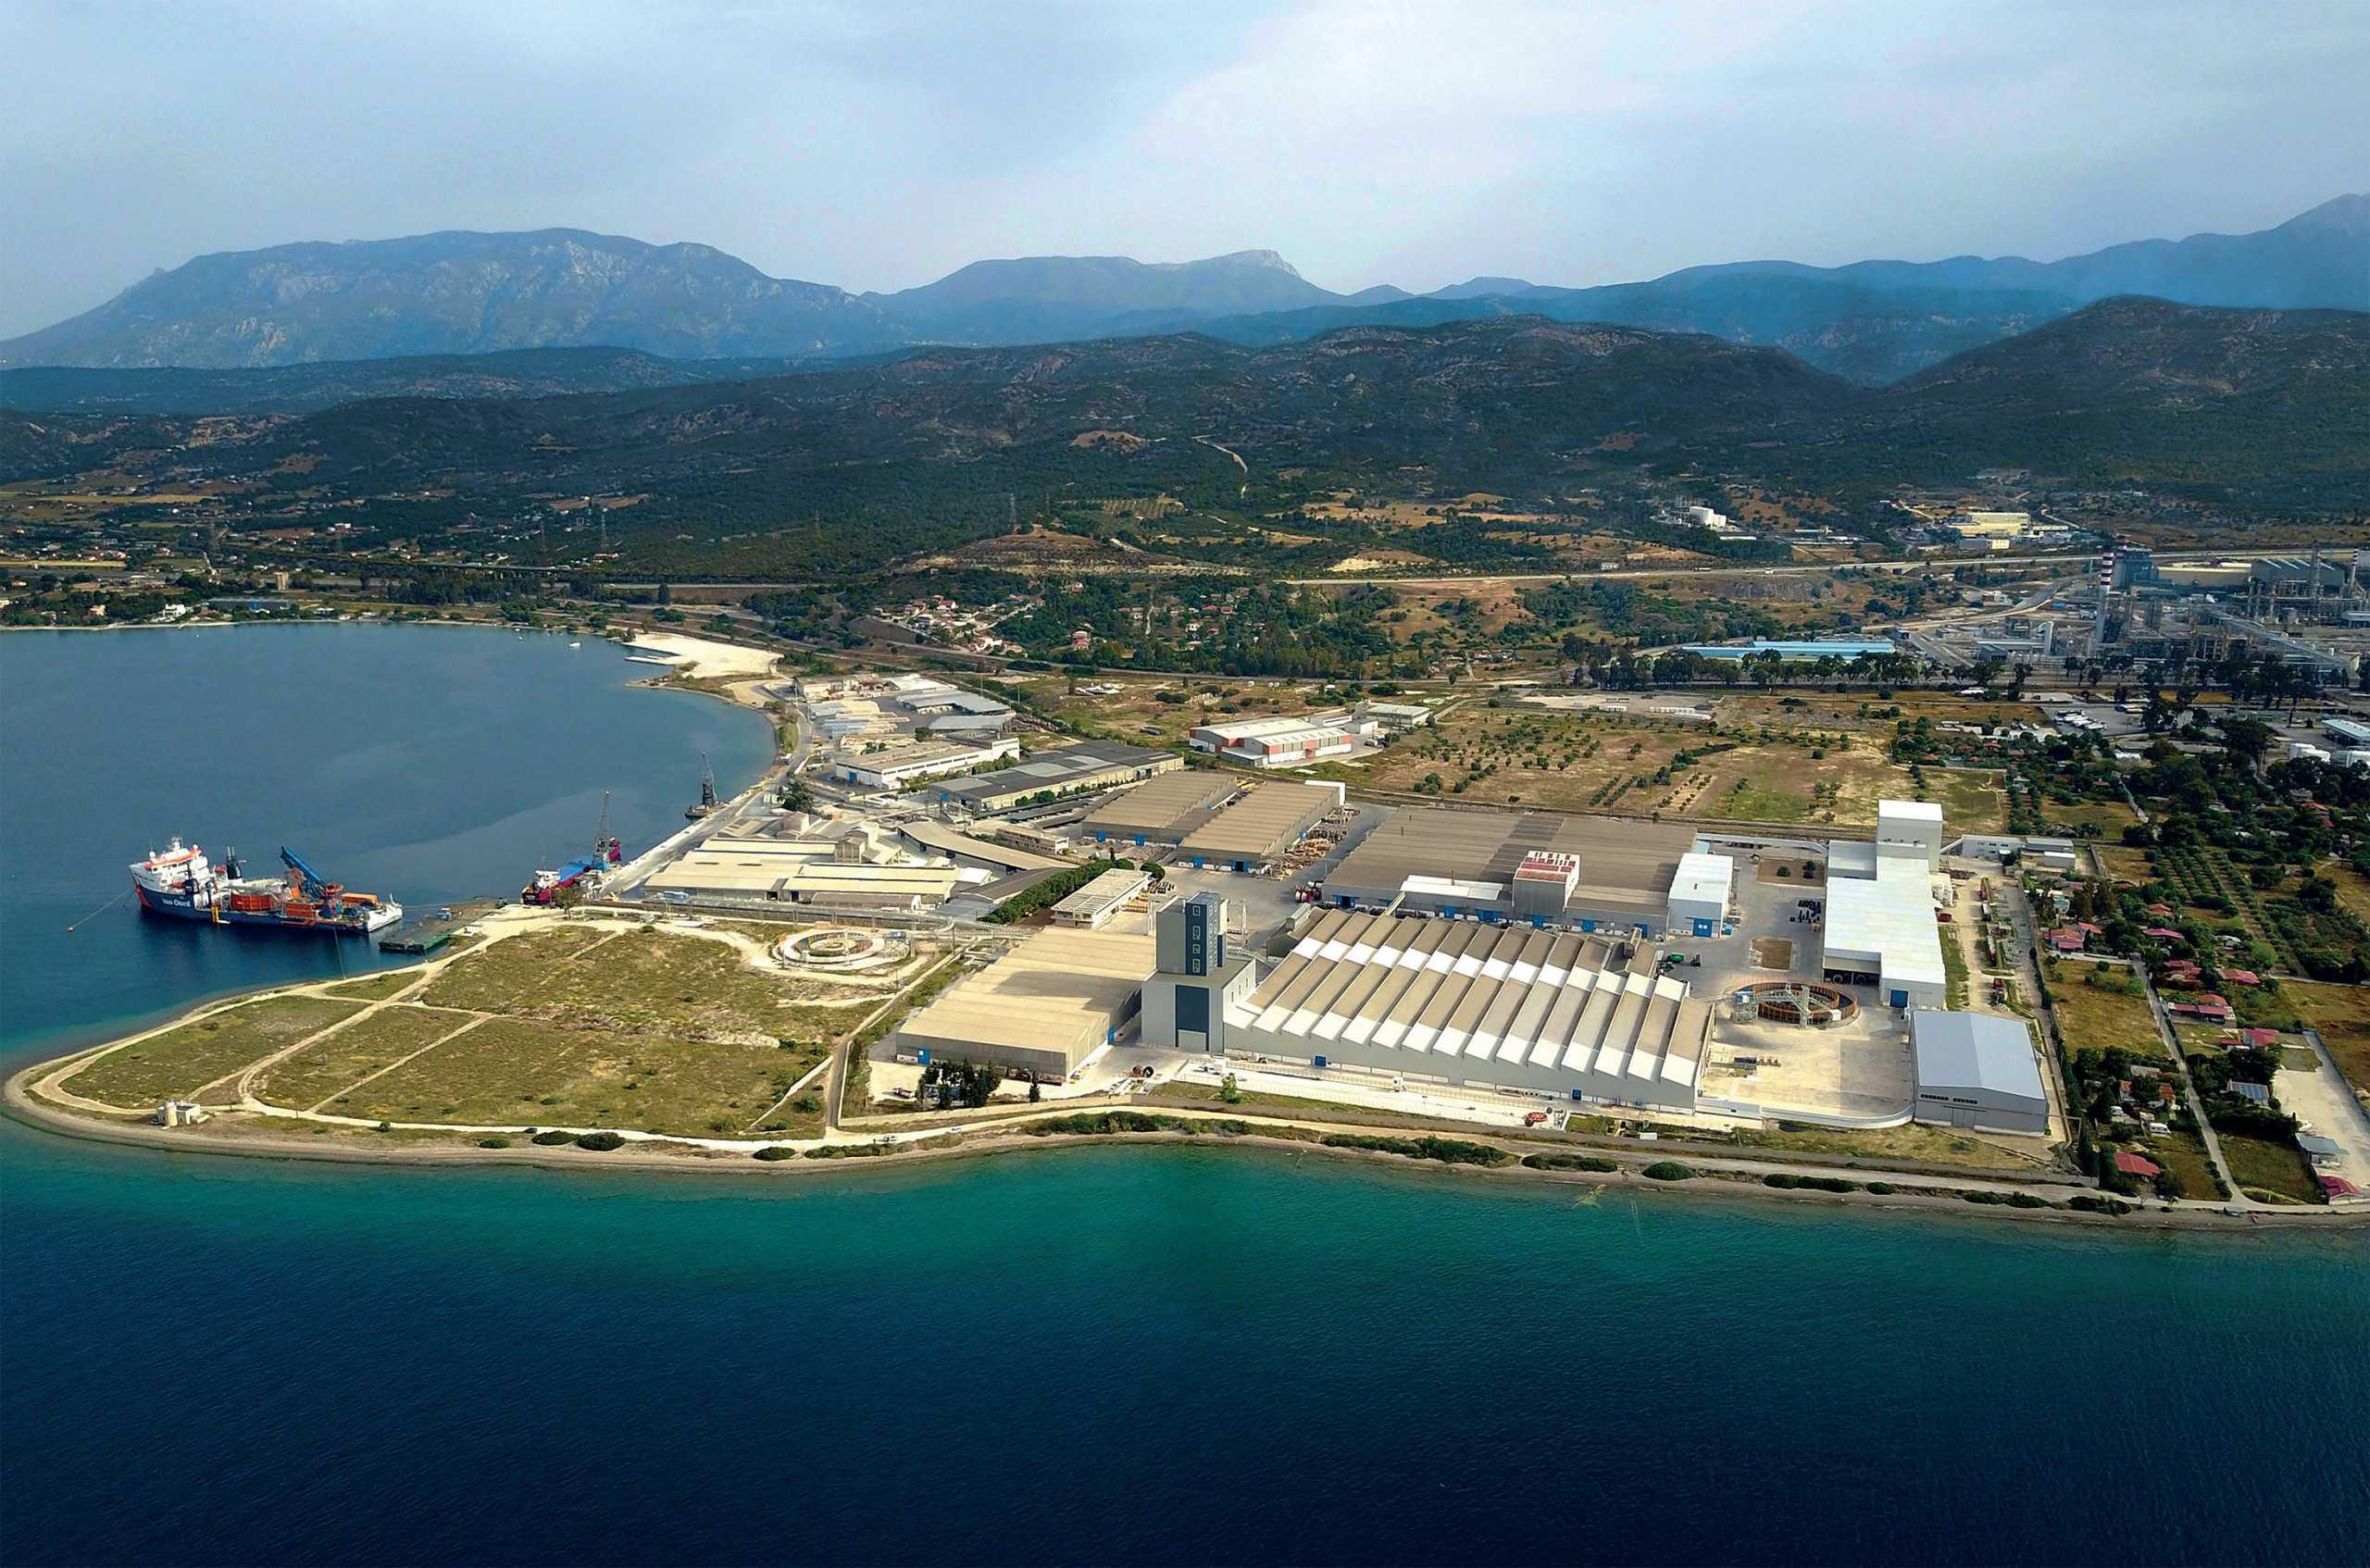 Hellenic Cables: Με υποβρύχια καλώδια από την Κόρινθο θα εξοπλίσει αιολικά πάρκα της Vattenfall στη Δανία